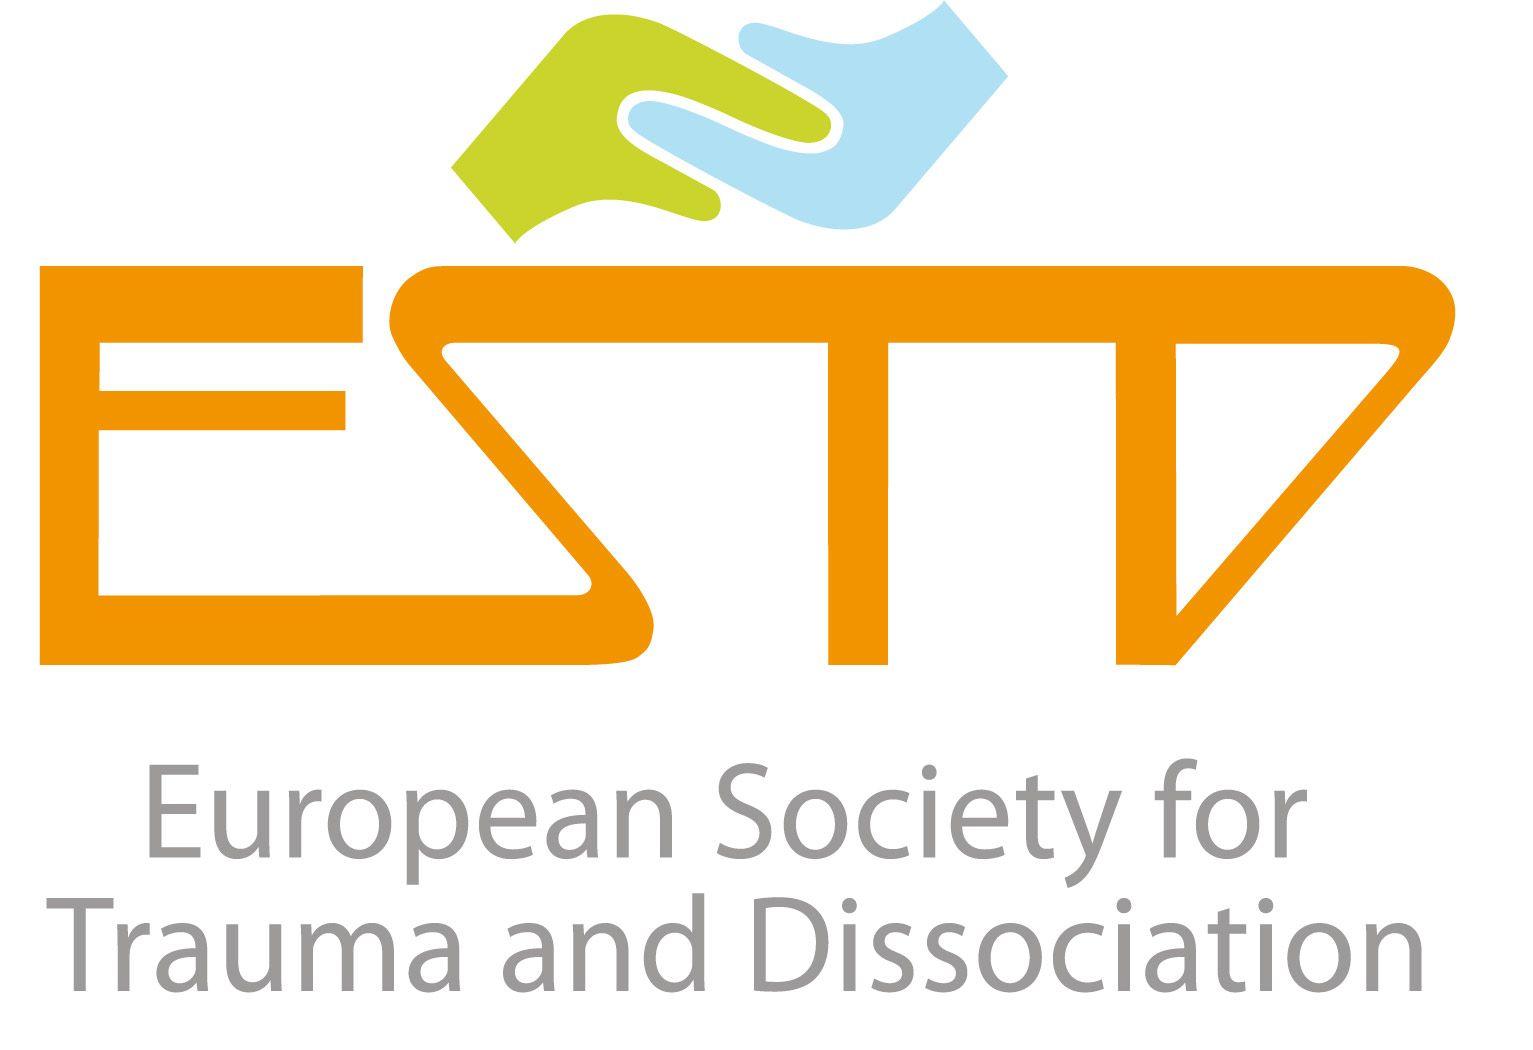 logo for European Society for Trauma and Dissociation